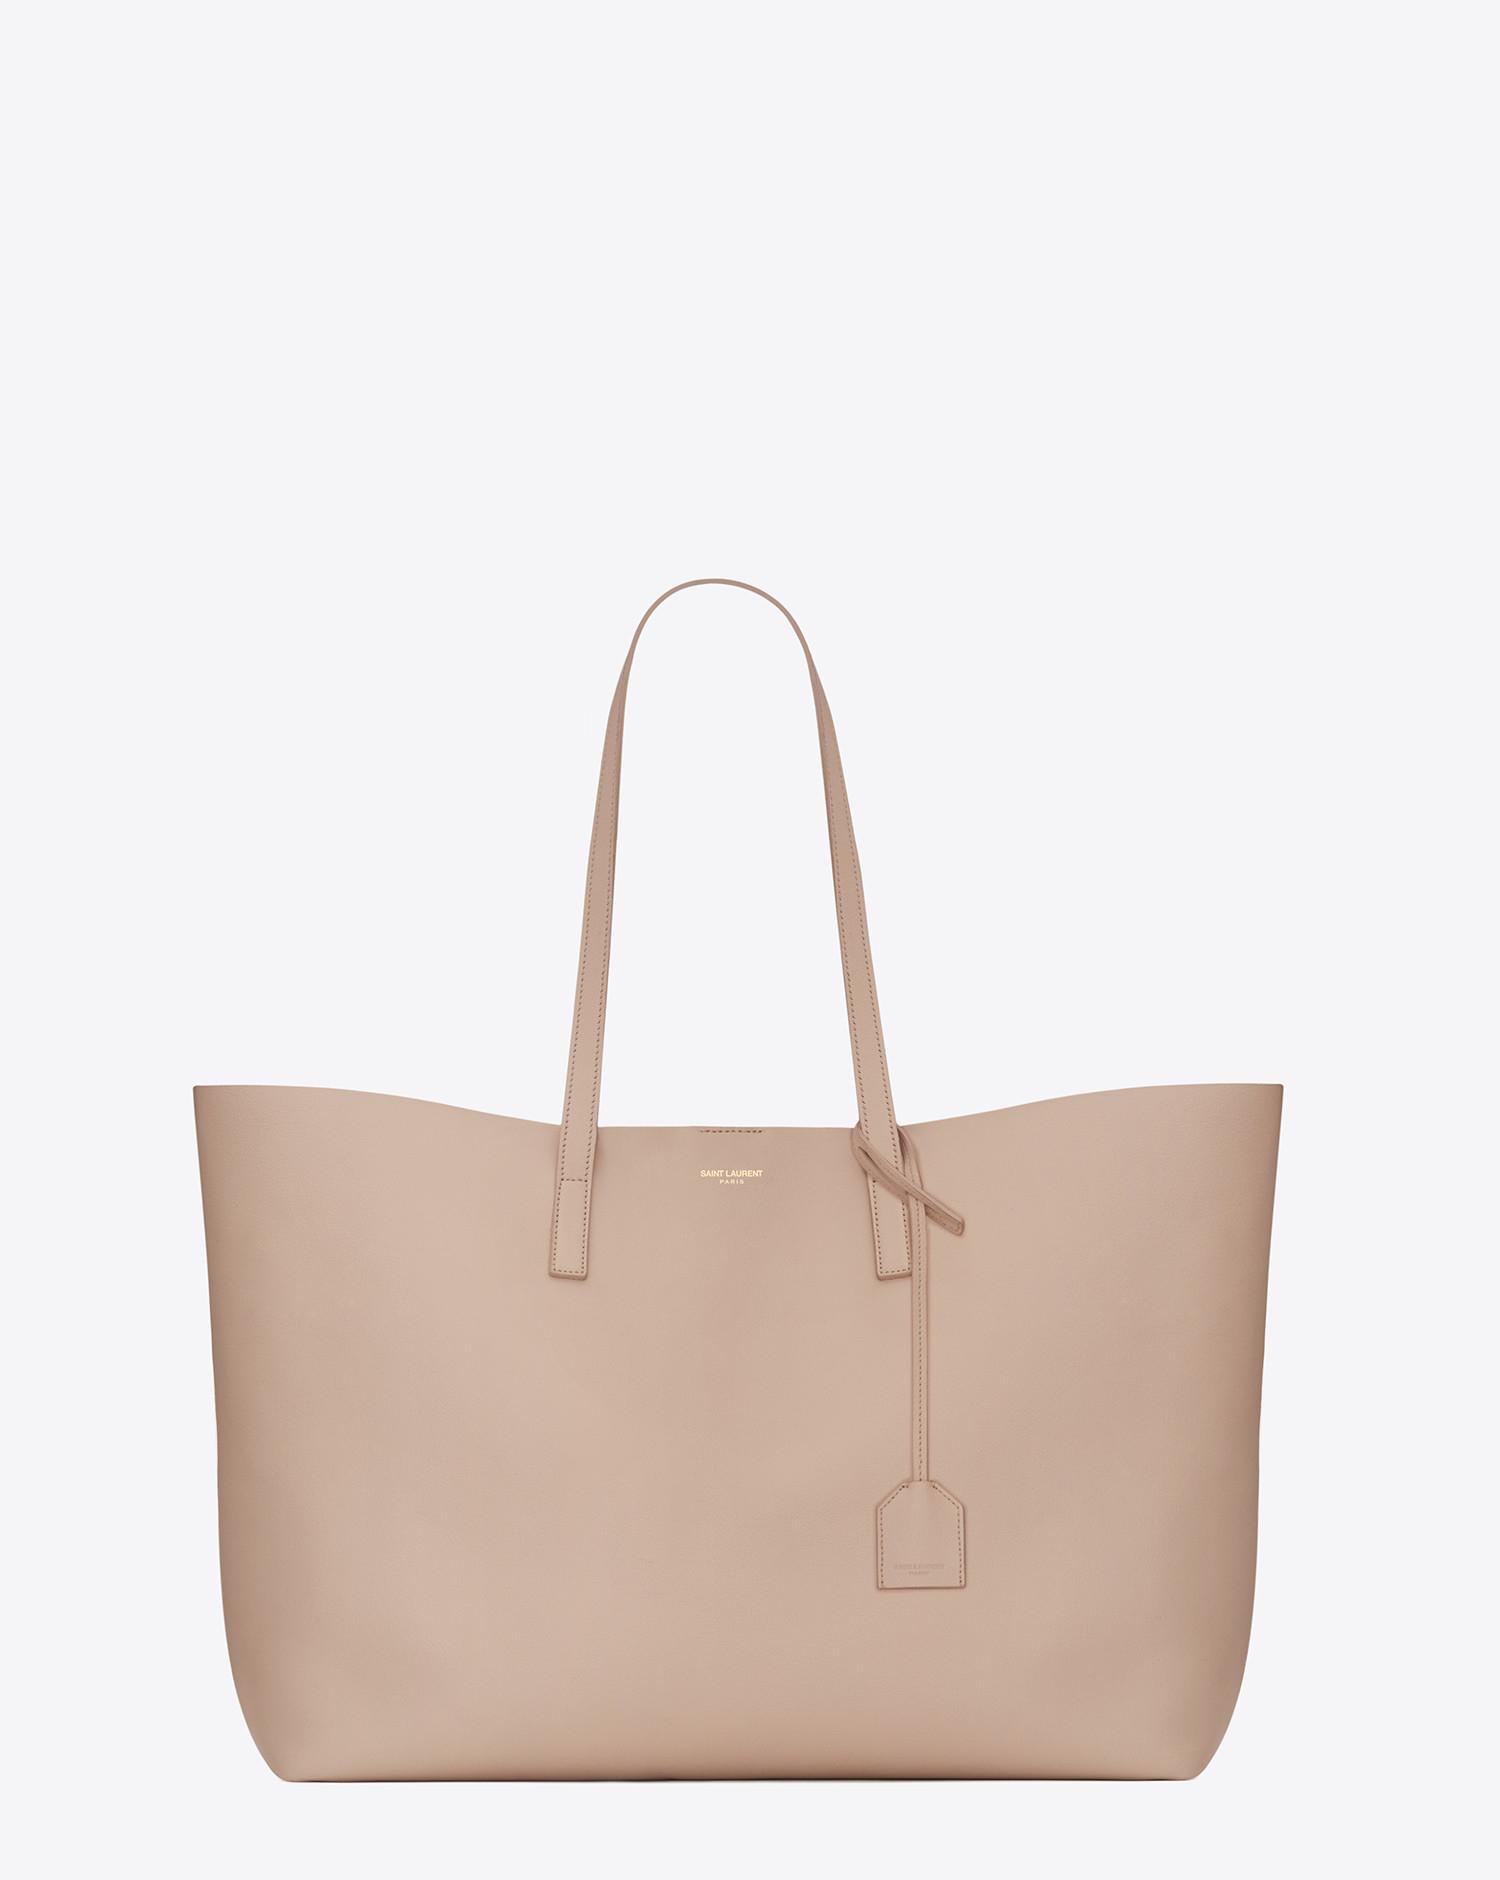 3eb21d4da4 Lyst - Saint Laurent Large Shopping Tote Bag In Pale Blush .